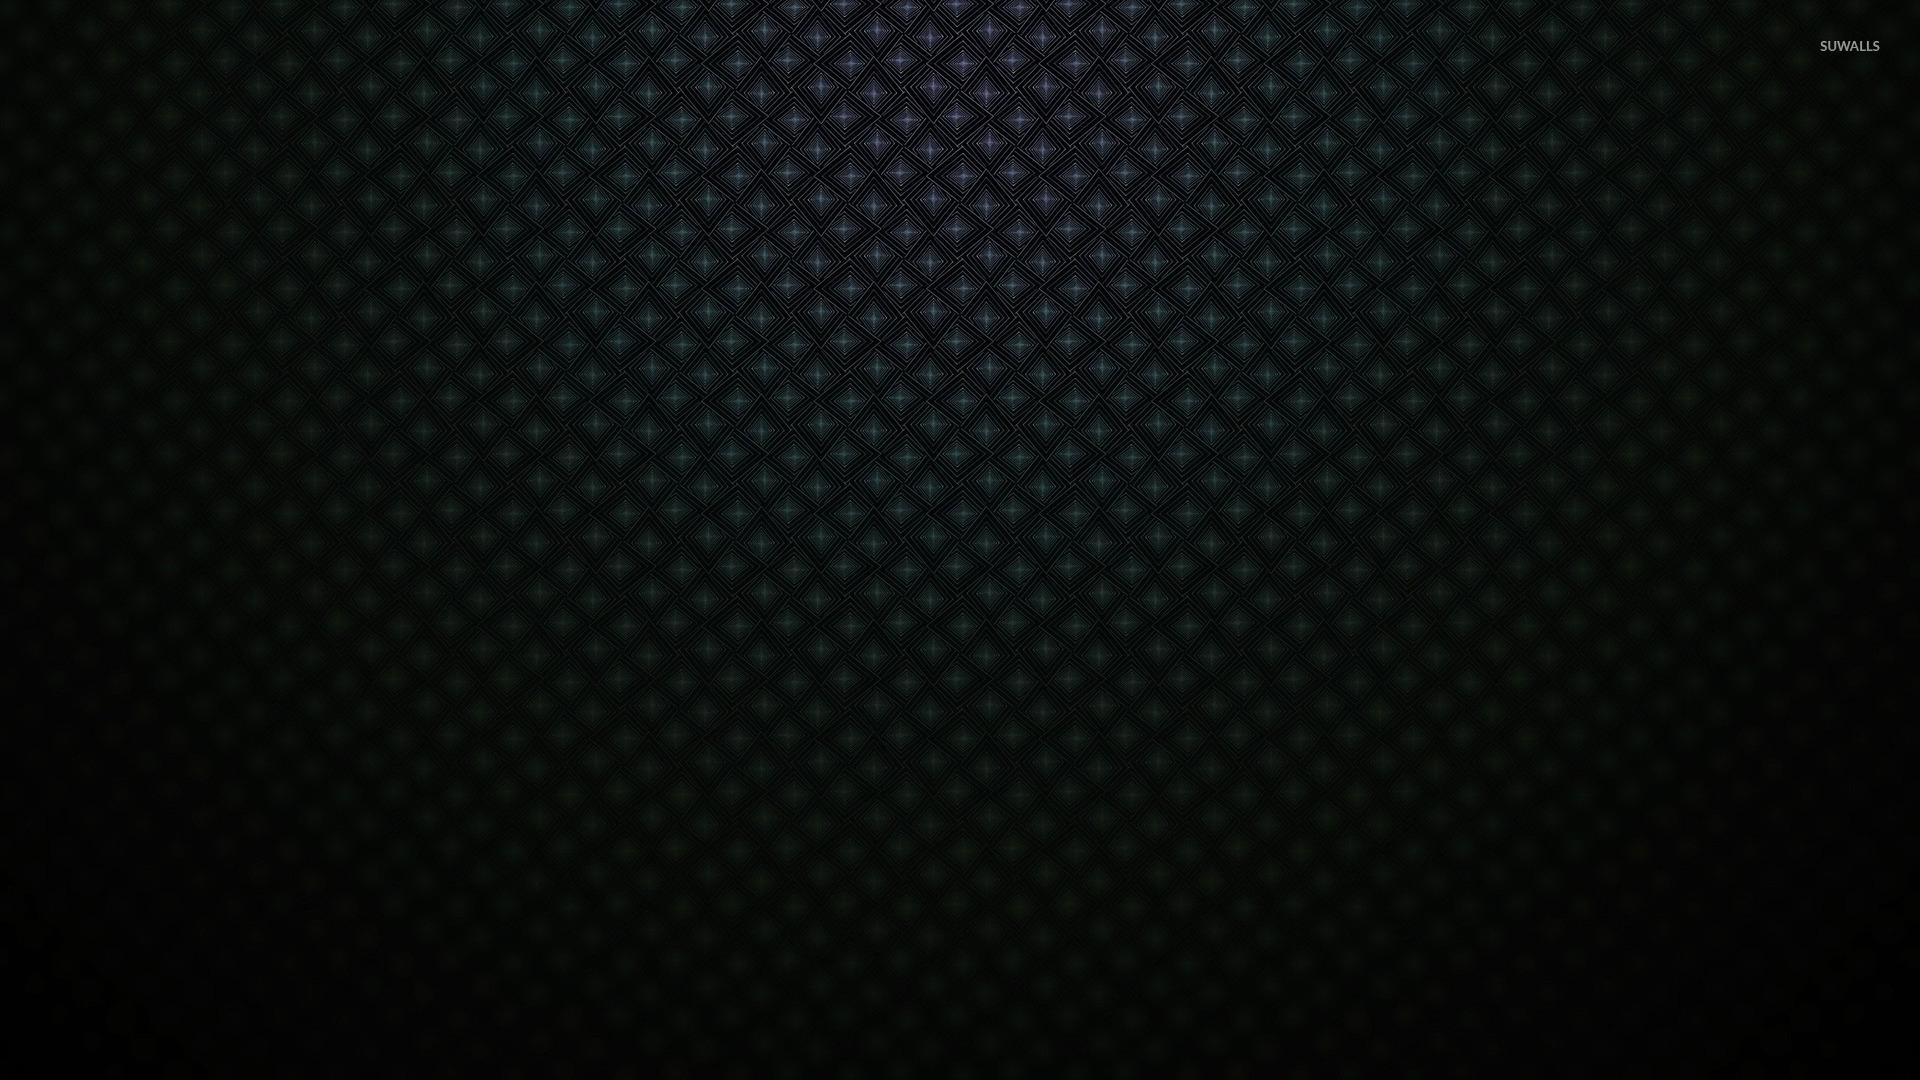 Diamond pattern wallpaper - Abstract wallpapers - #24023